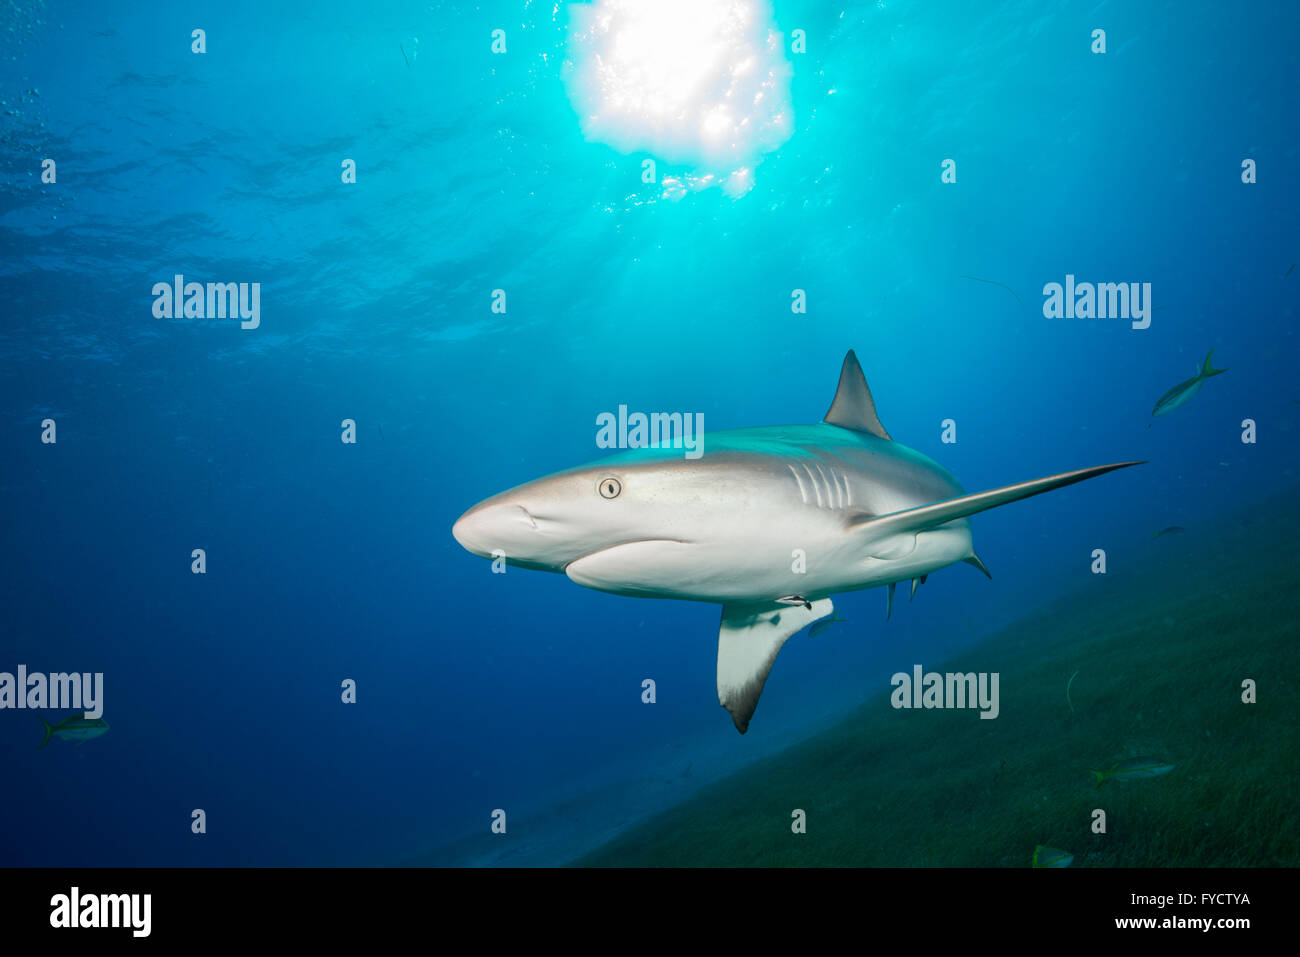 Caribbean reef shark, Carcharhinus perezi, swimming over seagrass, Bahamas - Stock Image